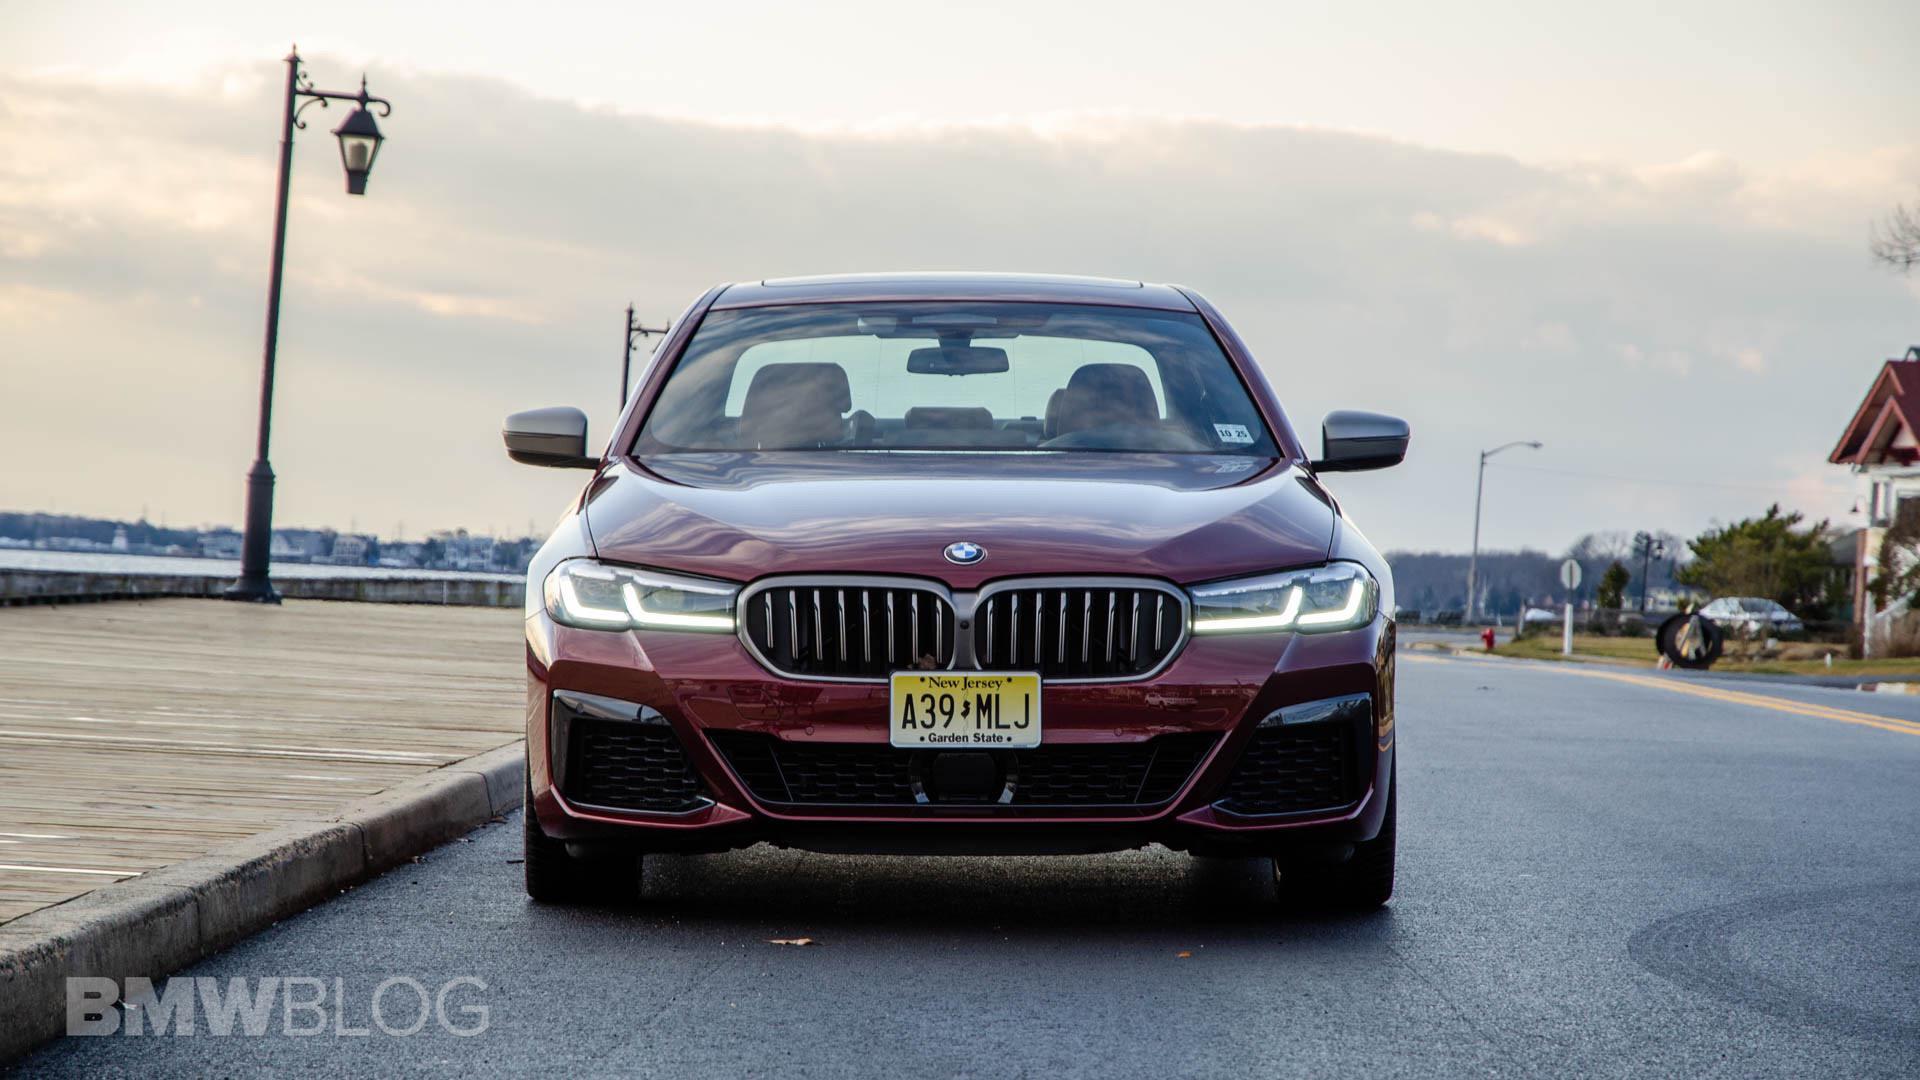 TEST DRIVE: 2021 BMW M550i xDrive — Its Own Unique Flavor